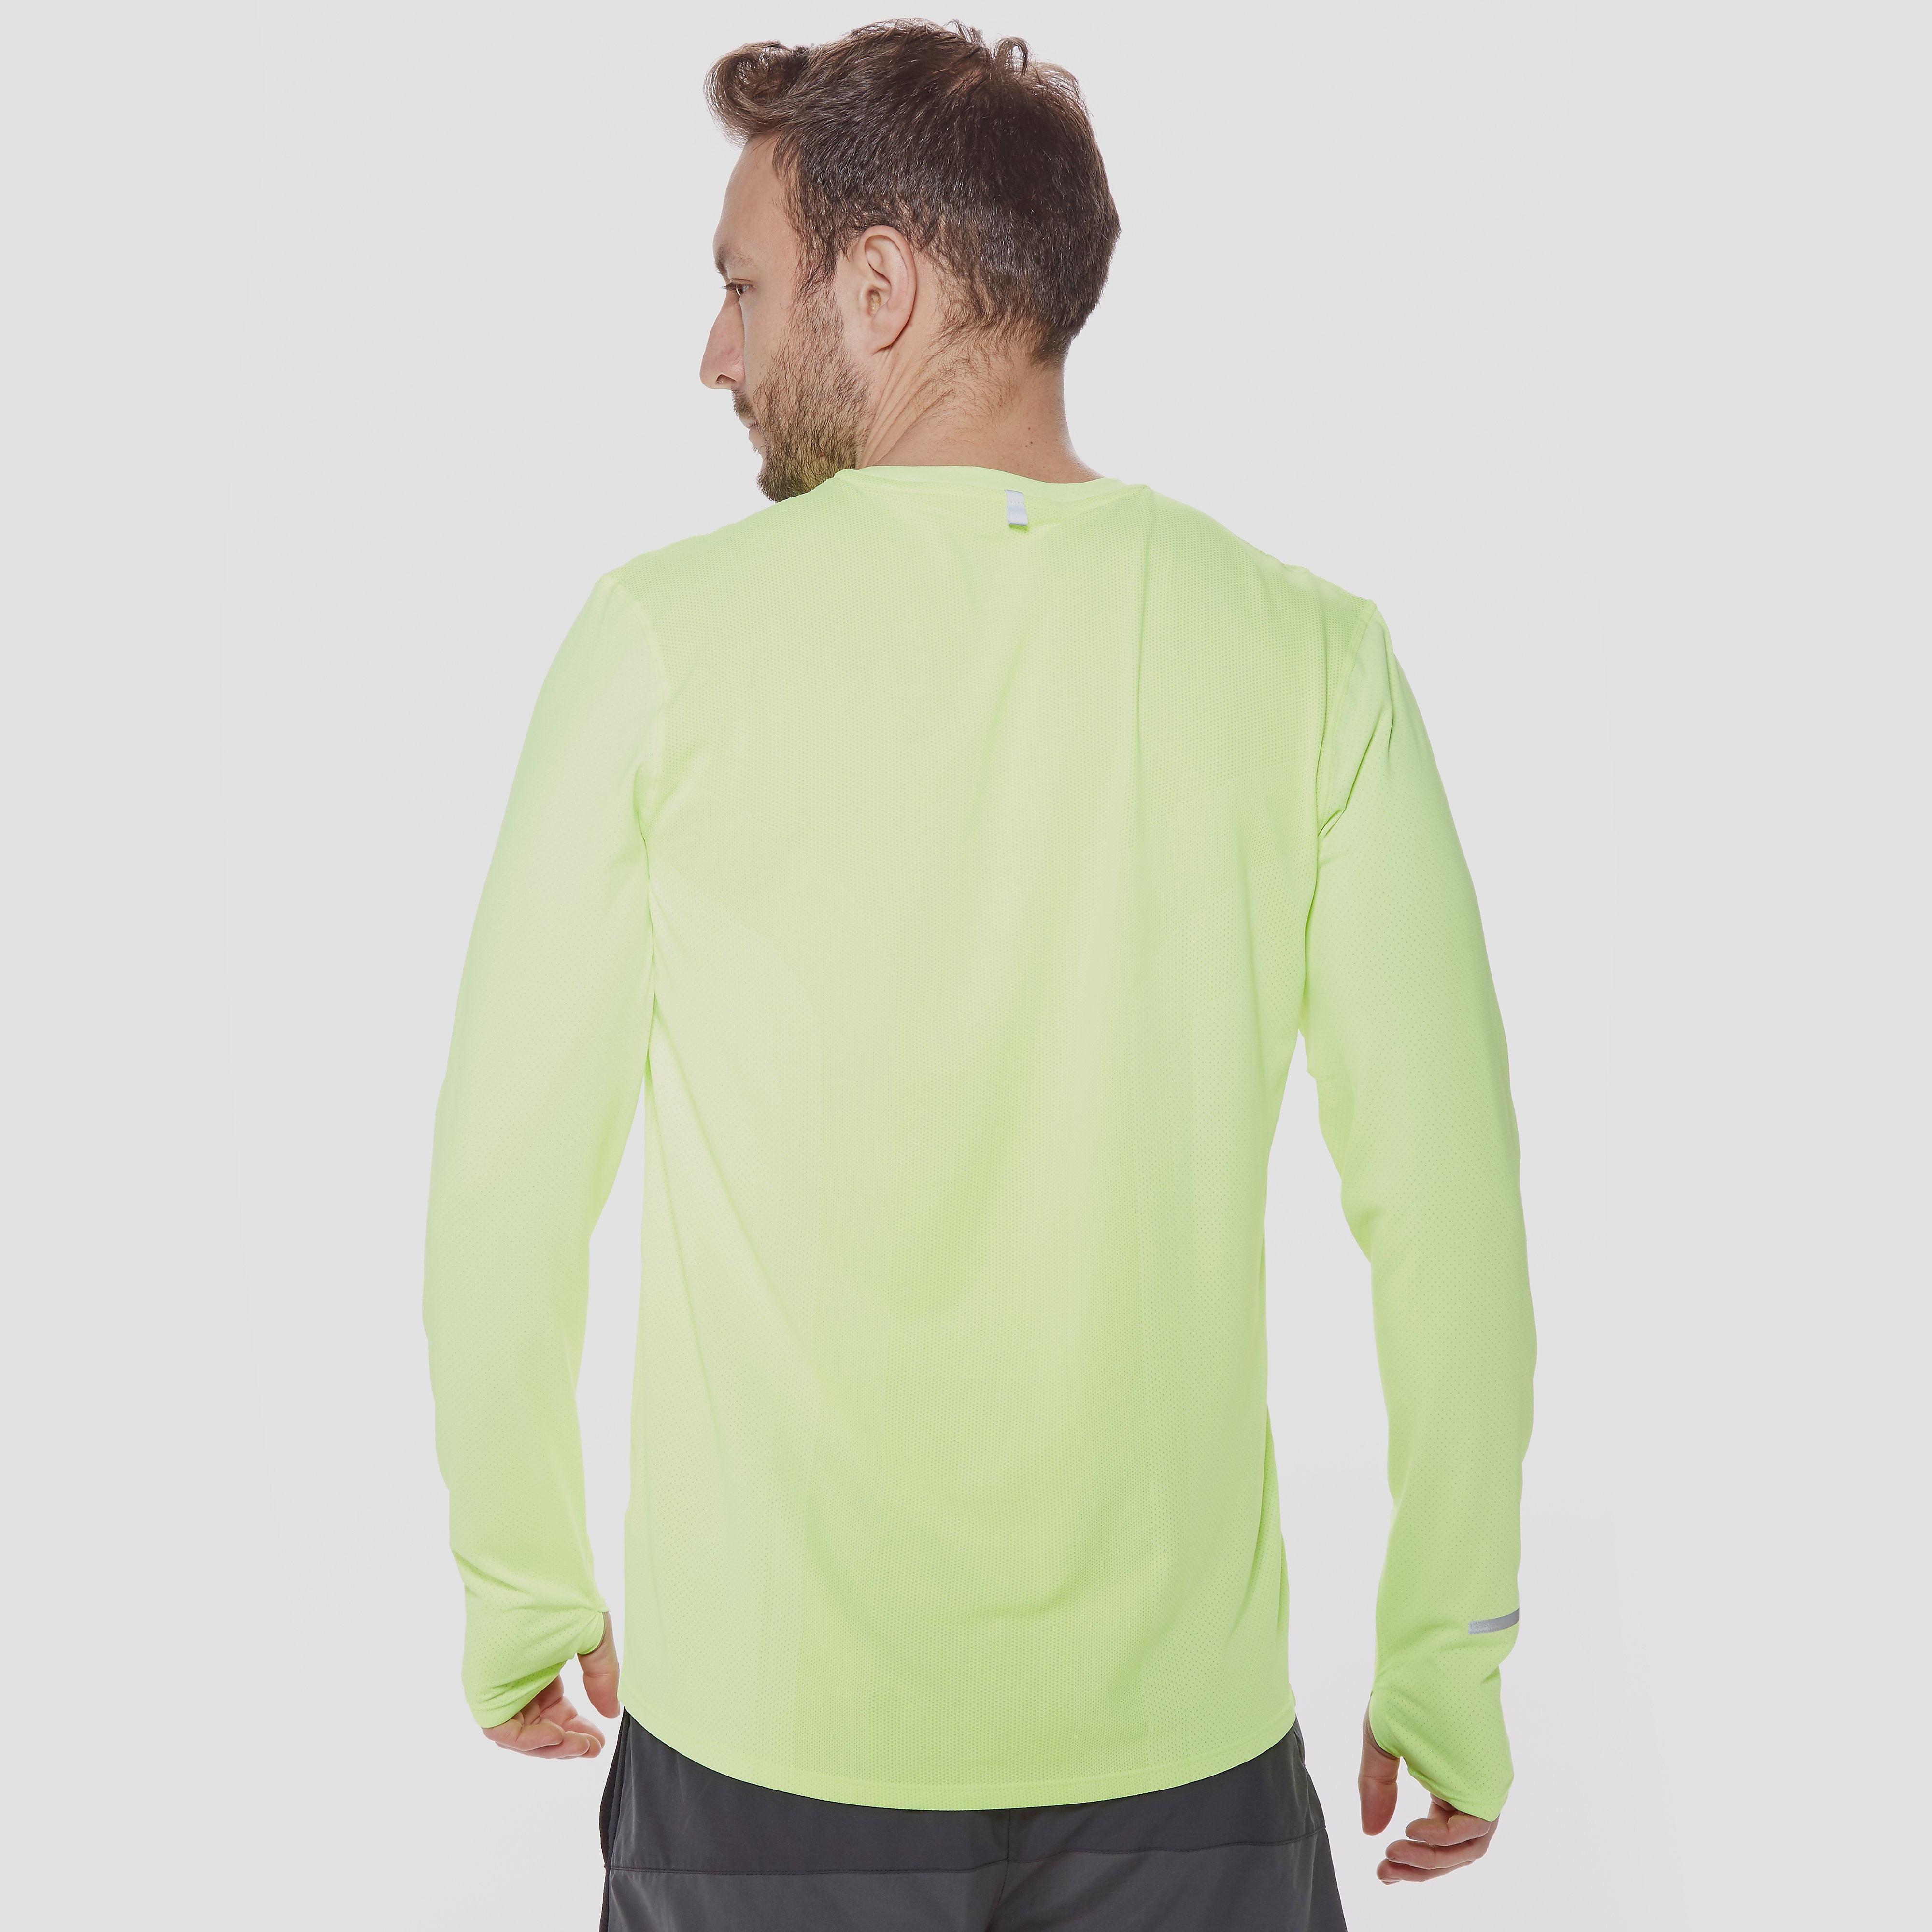 Nike Men's Dri-FIT Contour Long-Sleeve Running T-Shirt